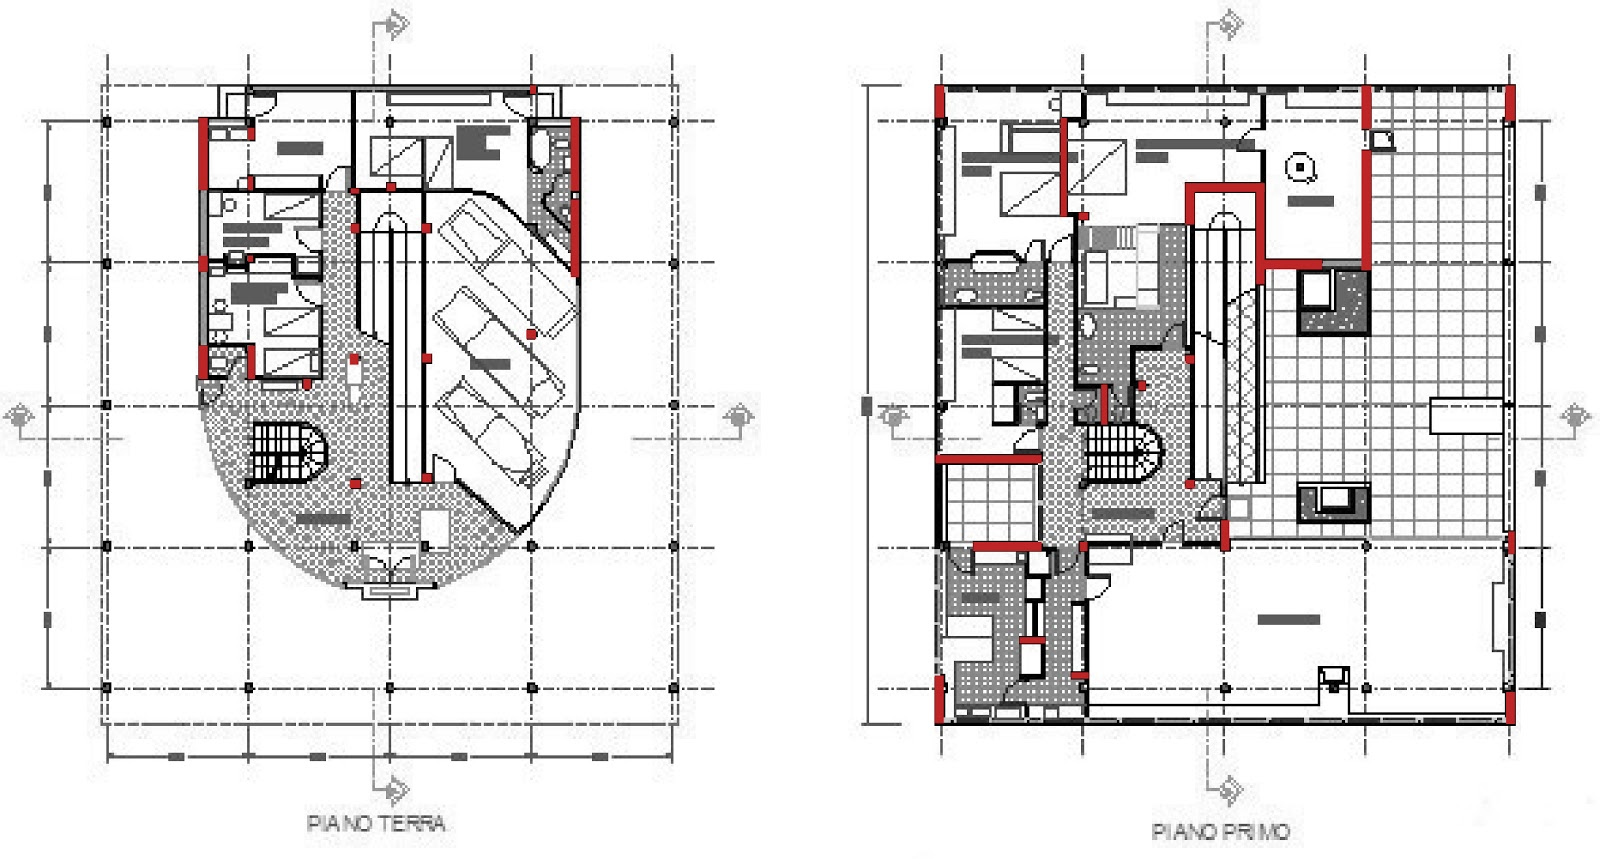 Contemporary European Architecture Regulation Or